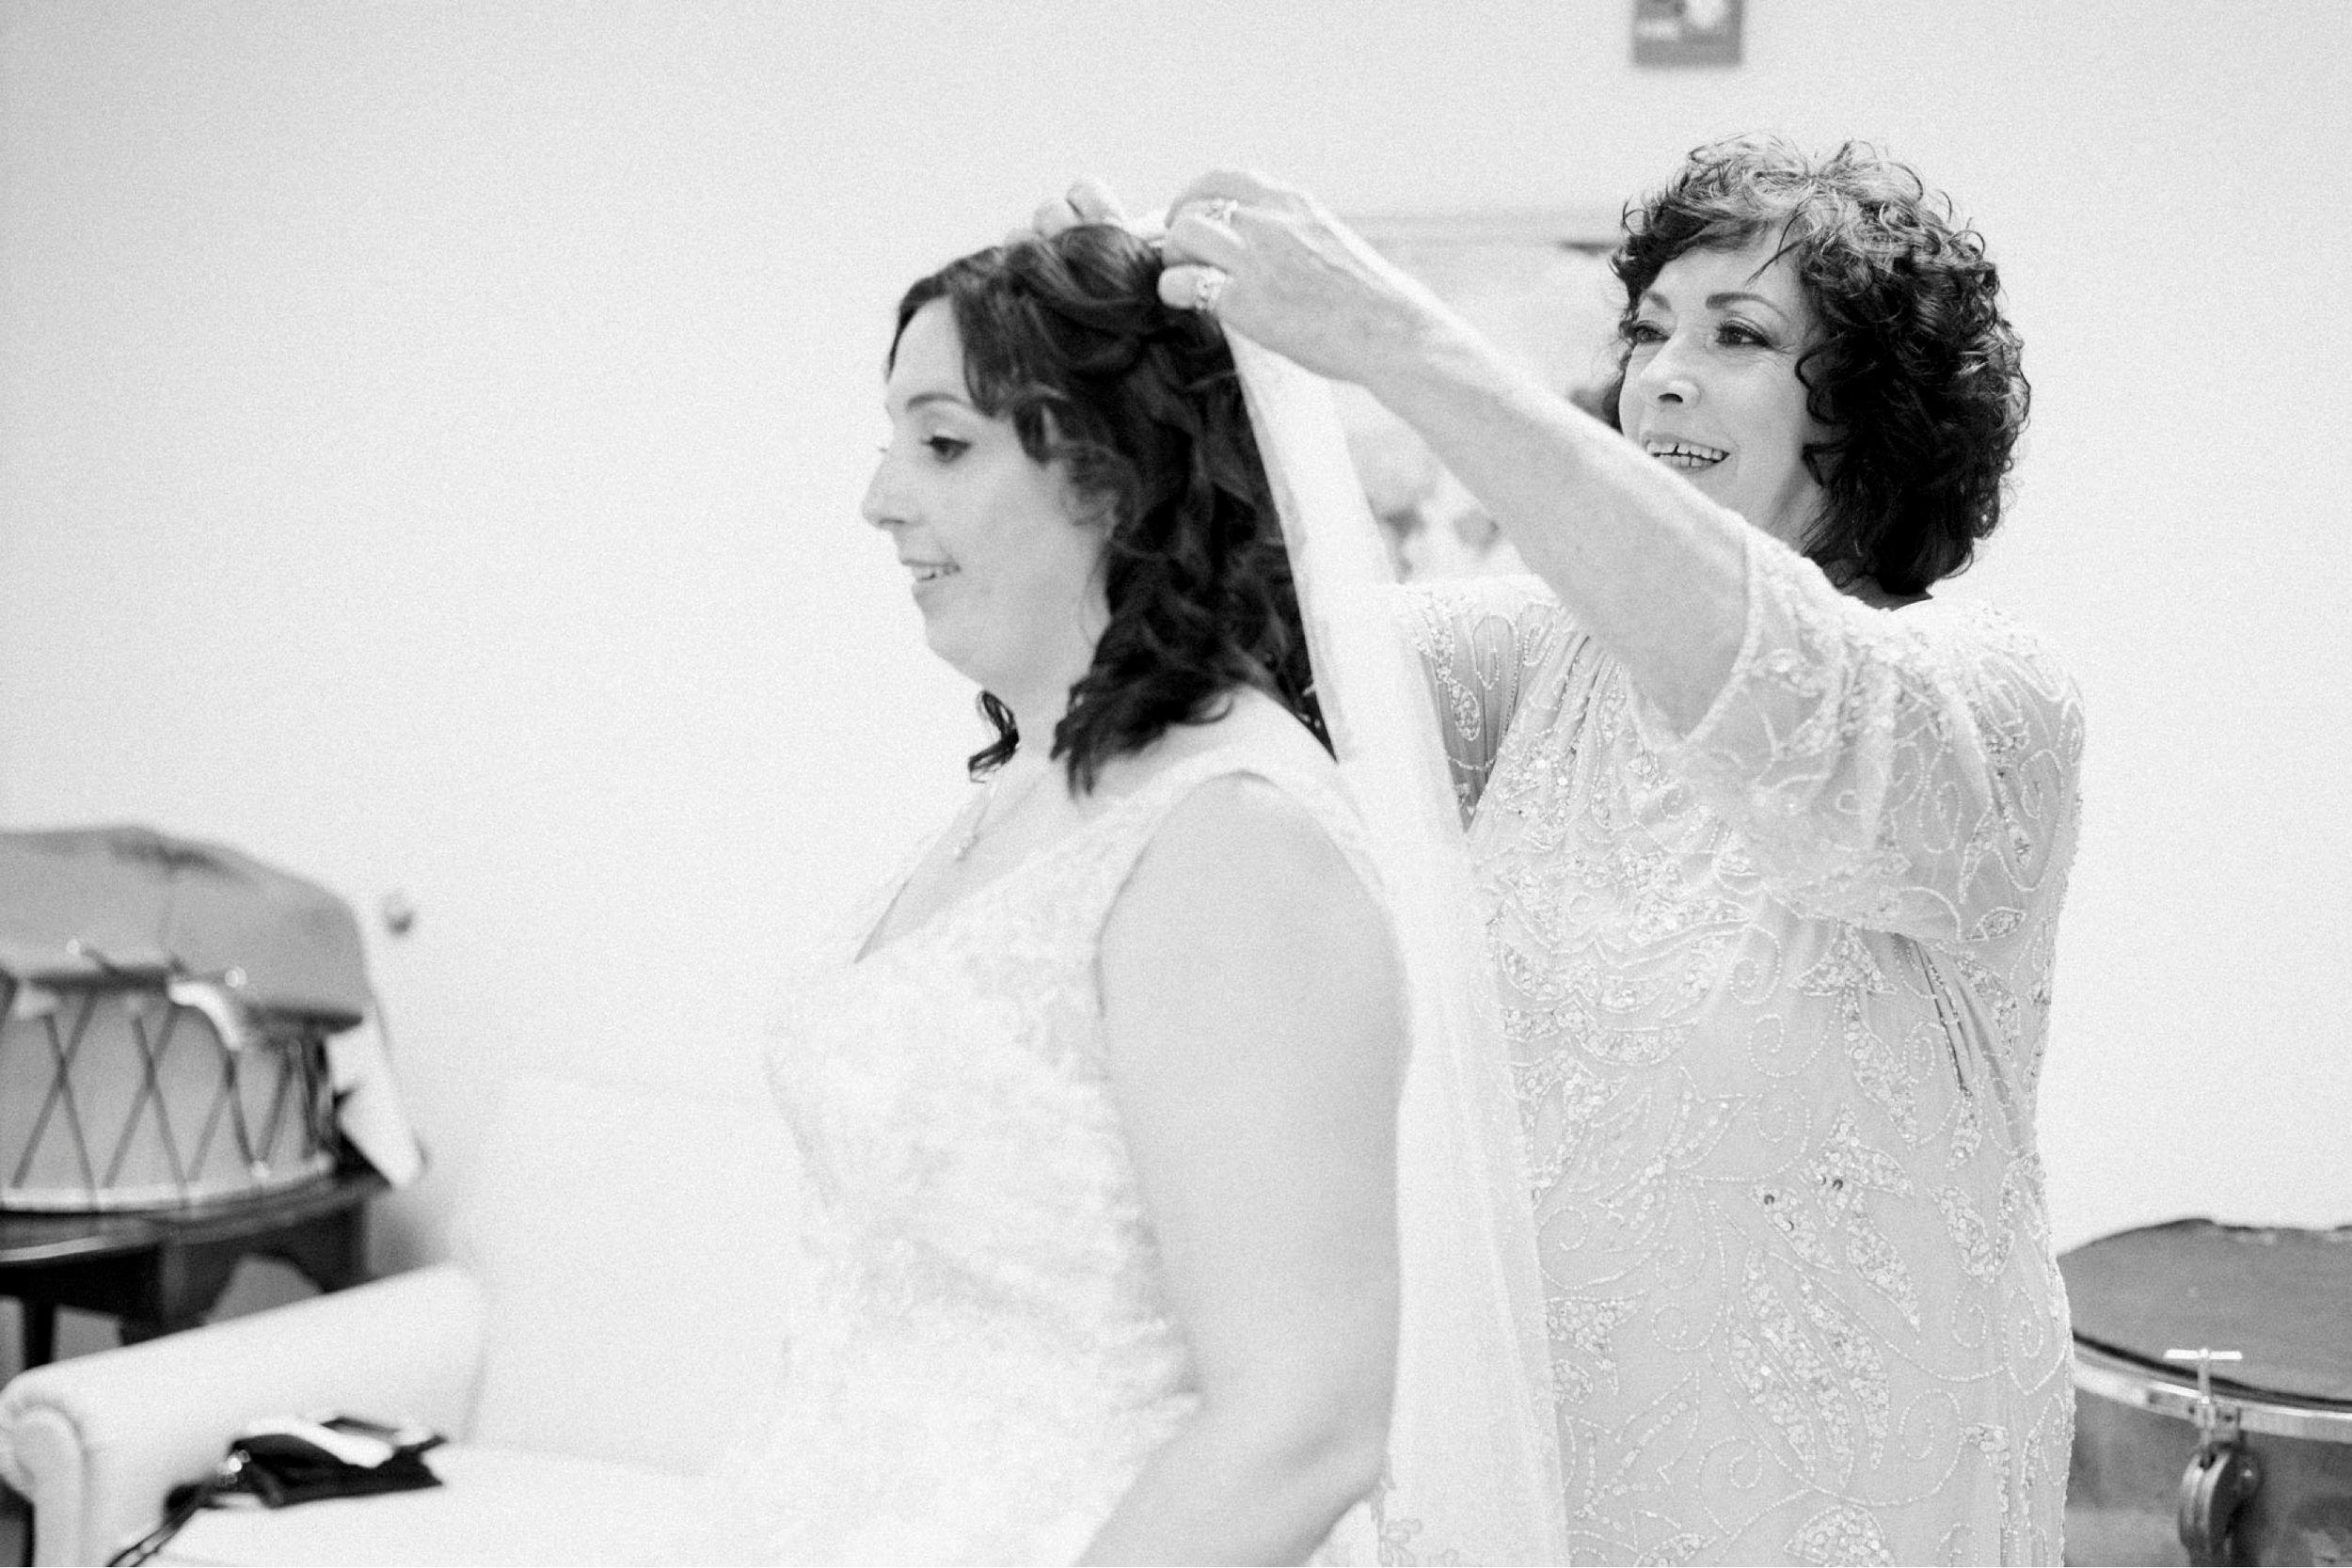 TheVirginianHotel_LynchburgVA_TheVirginianHotelWedding_Virginiaweddingphotographer_Lynchburgvawedding 19.jpg